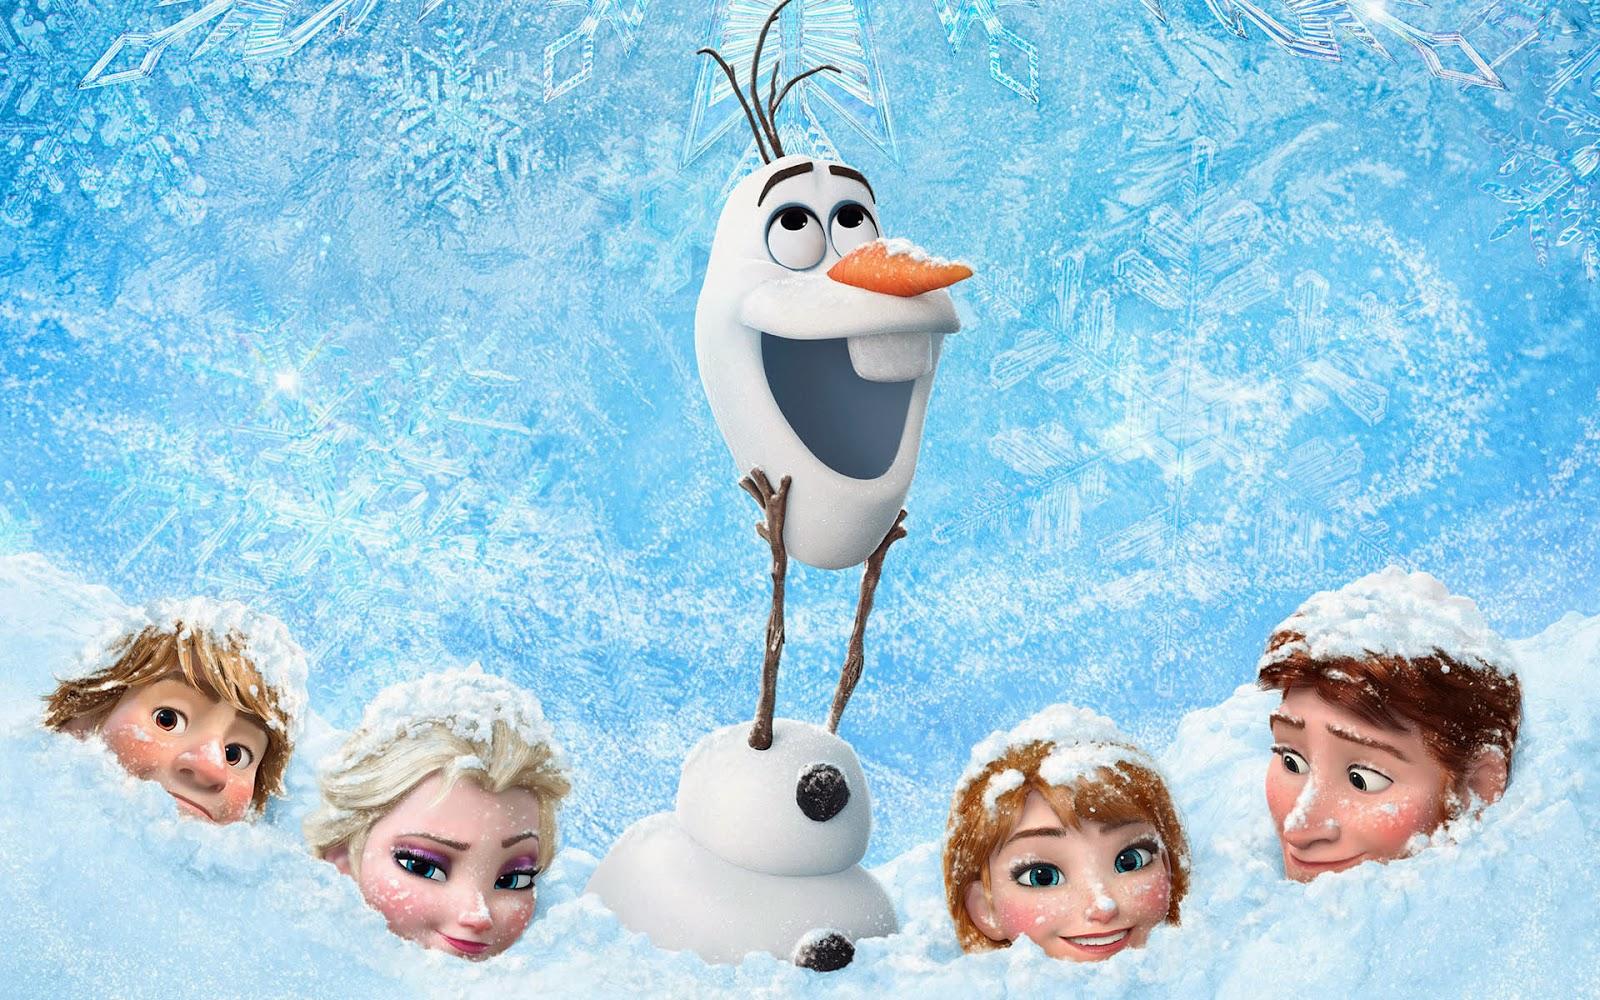 Bilder Walt Disney 3D animationsfilm Frozen wallpaper 1600x1000